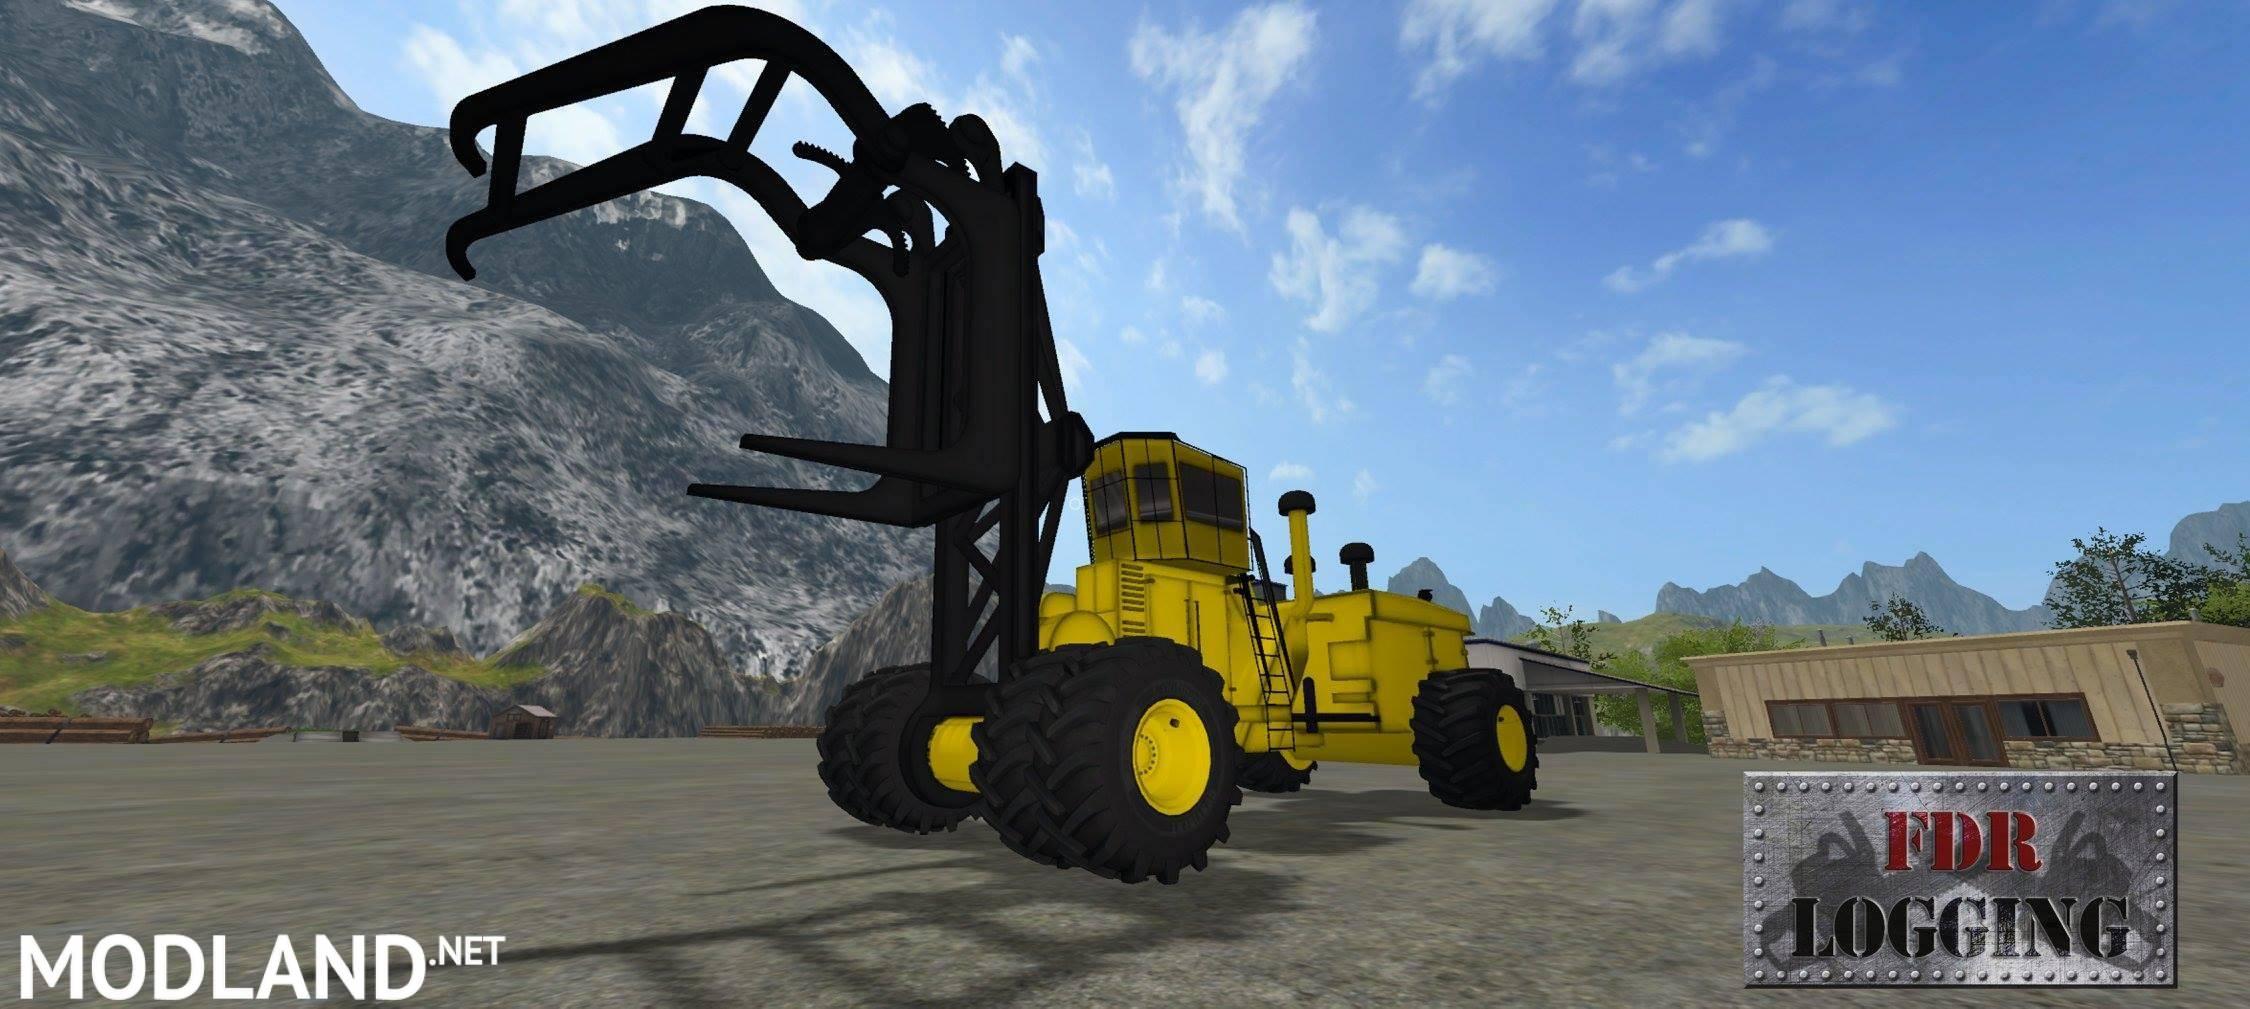 fdr logging letourneau mod farming simulator